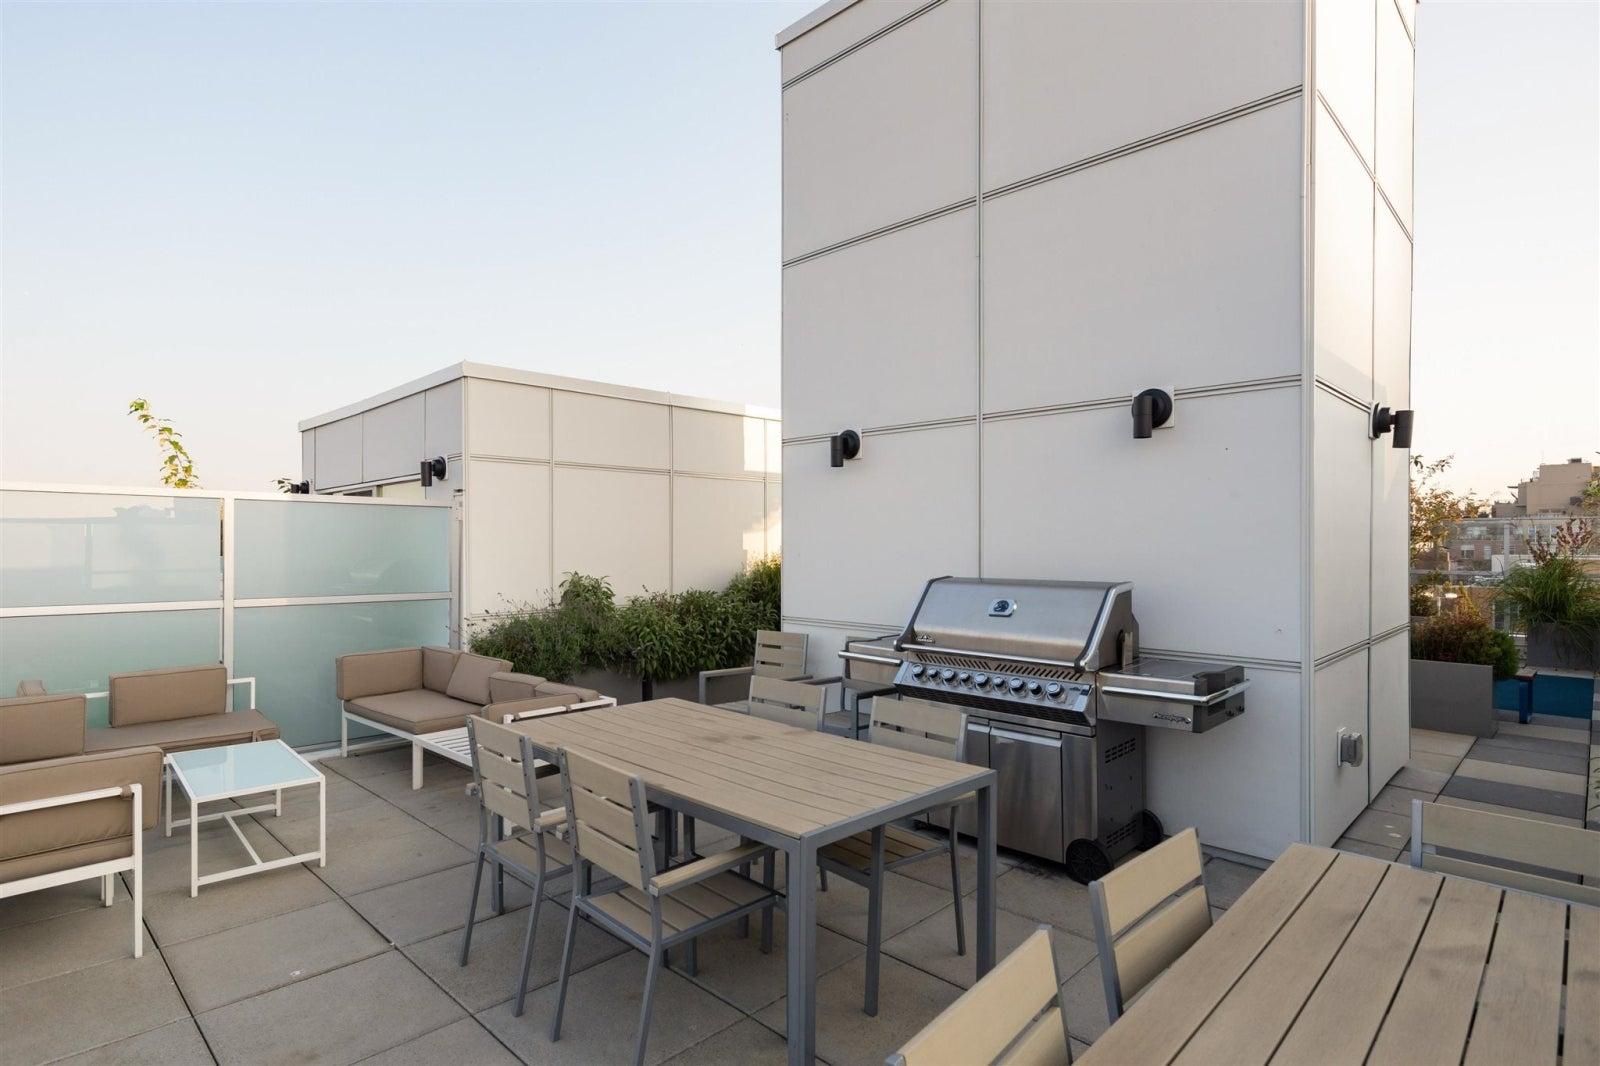 408 379 E BROADWAY AVENUE - Mount Pleasant VE Apartment/Condo for sale, 2 Bedrooms (R2599900) #29